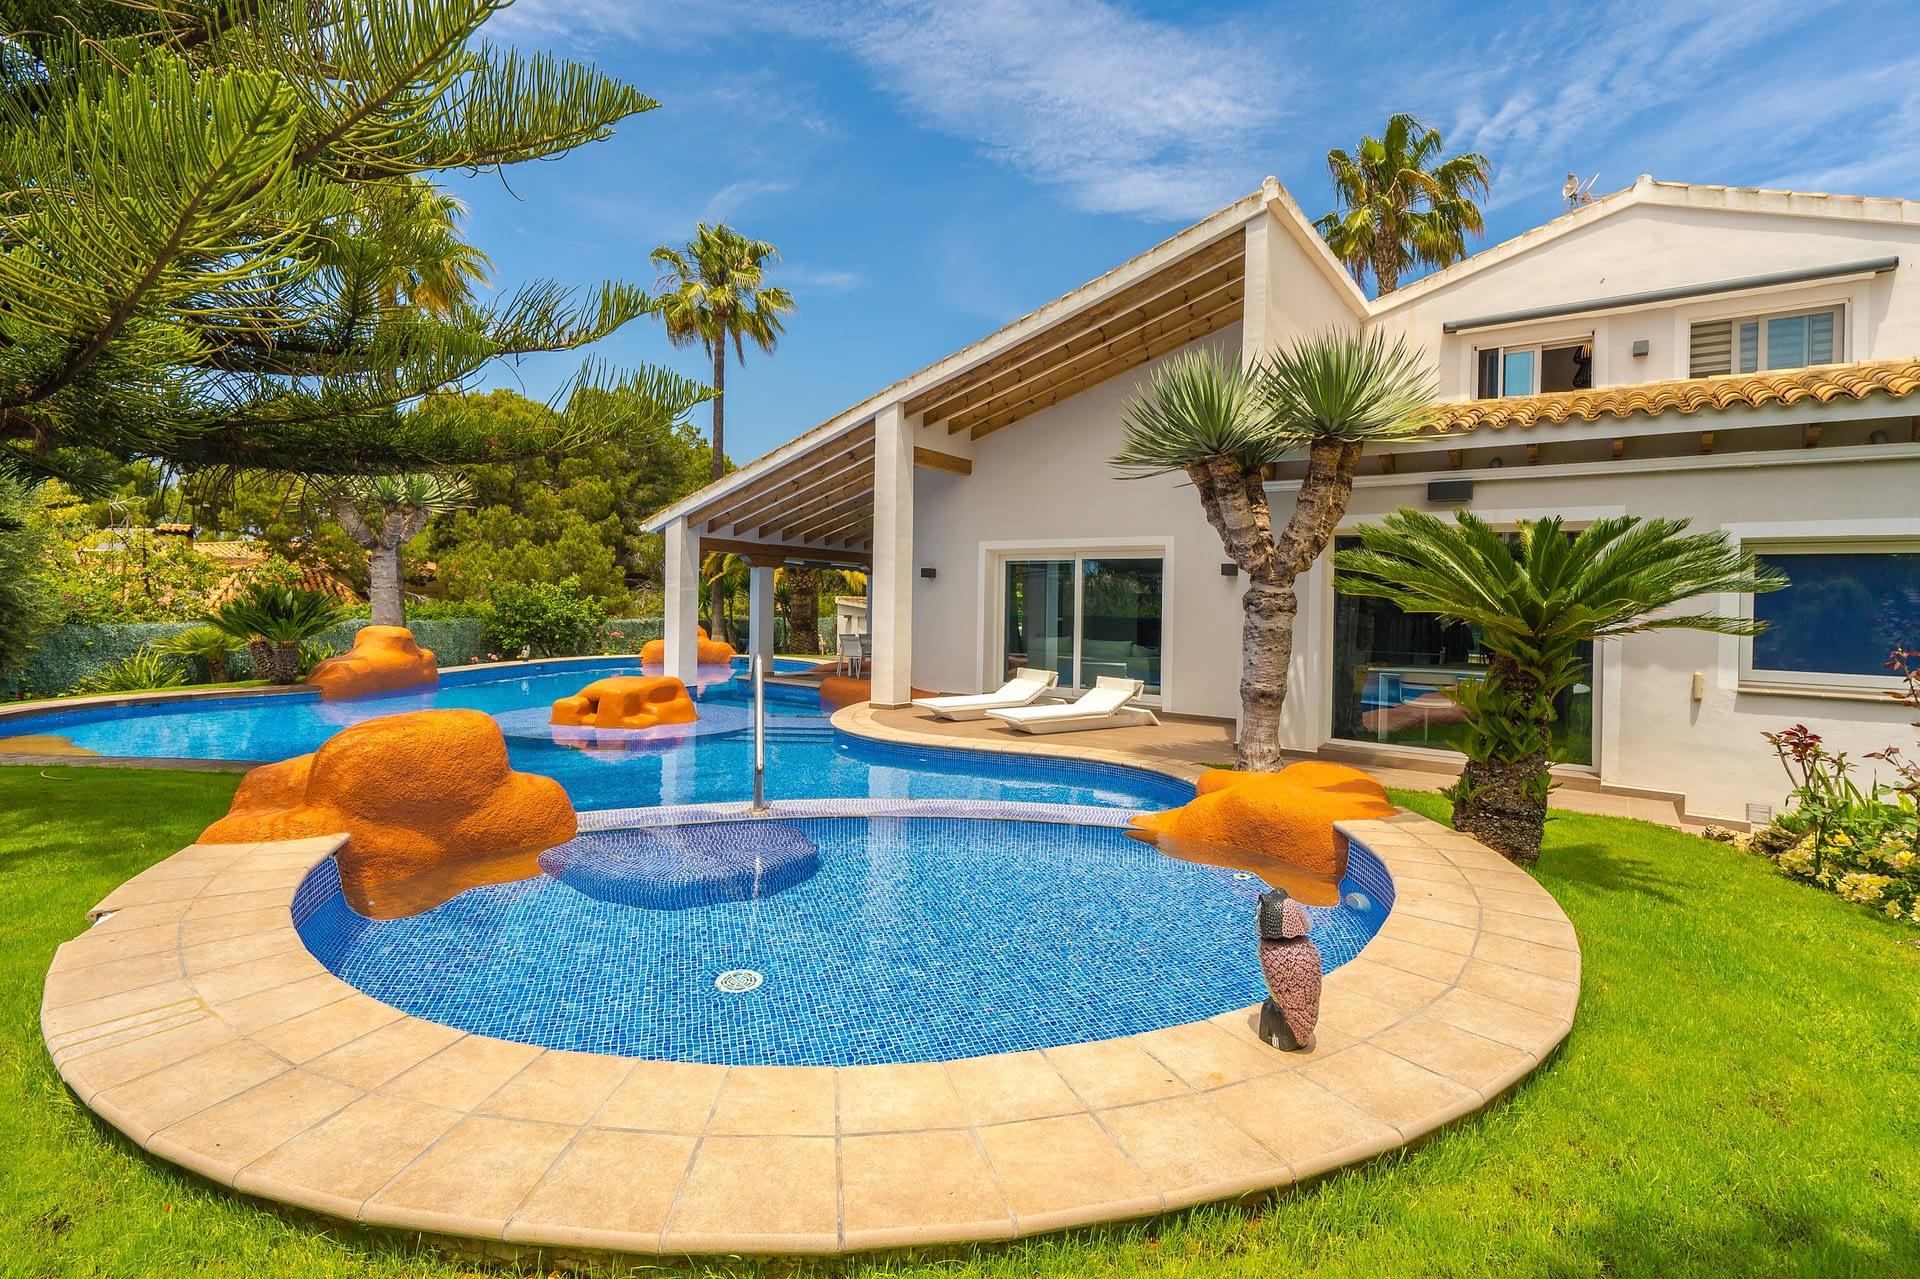 Pierluigi Cavarra - fotografo de Inmobiliaria - real estate photography costa blanca - ejemplo 8